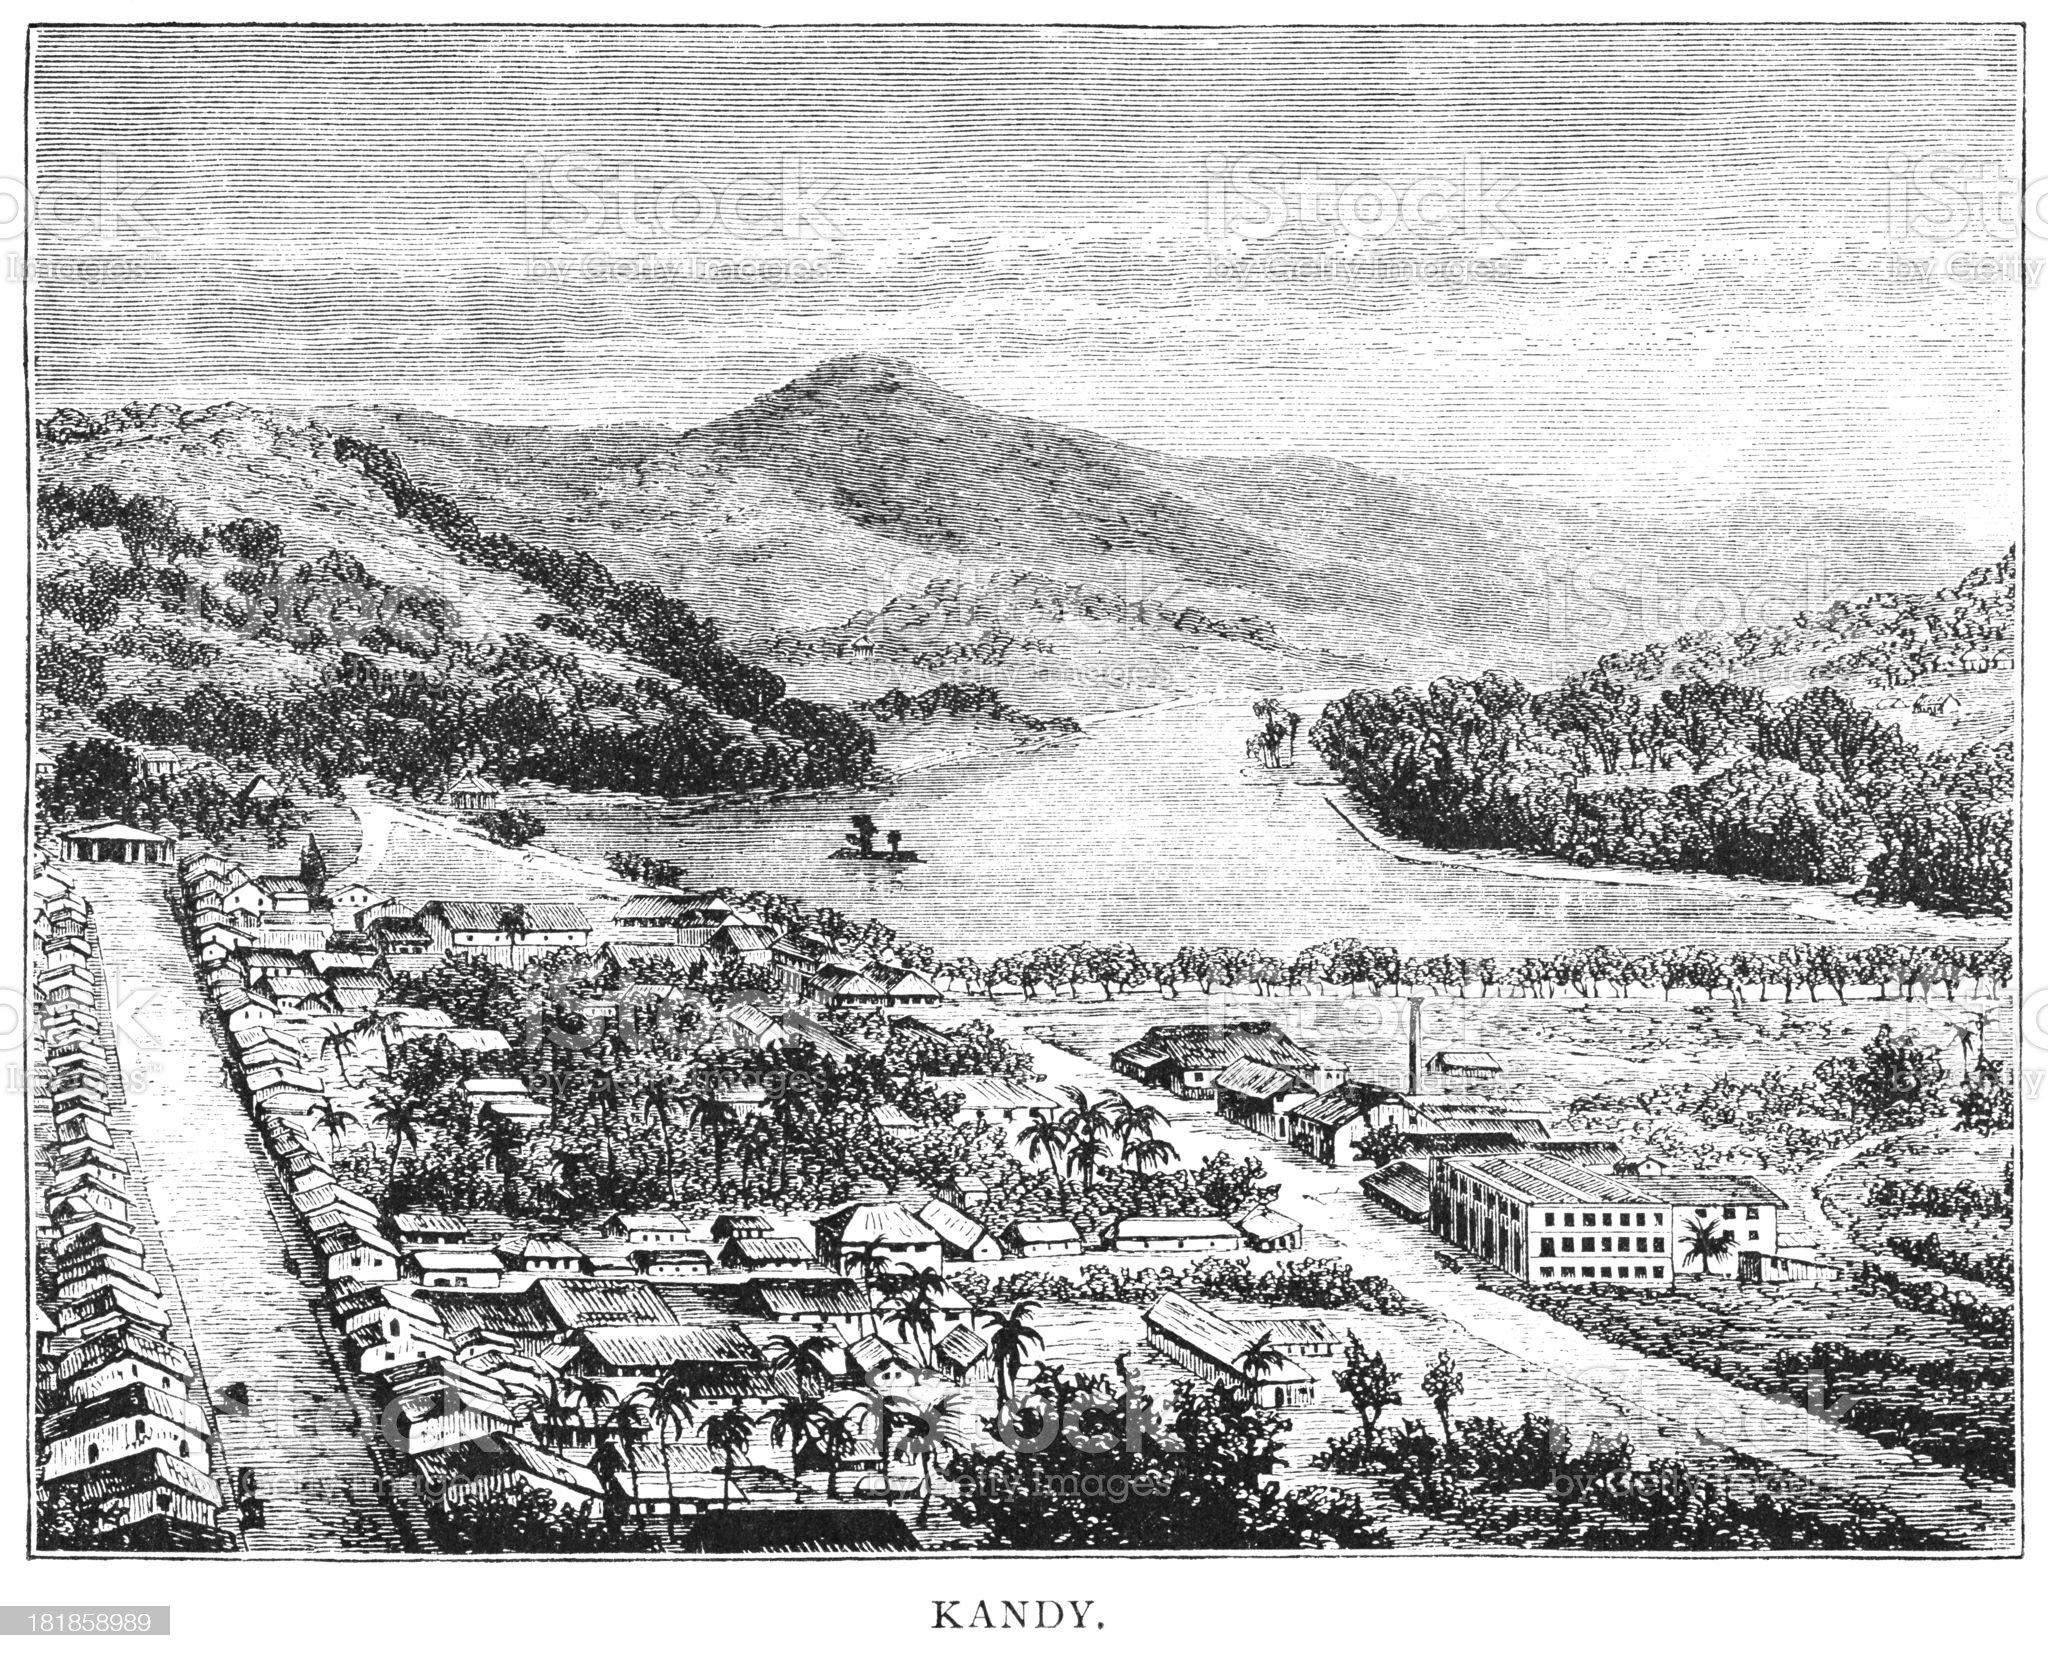 Kandy, Ceylon - Victorian engraving royalty-free stock vector art